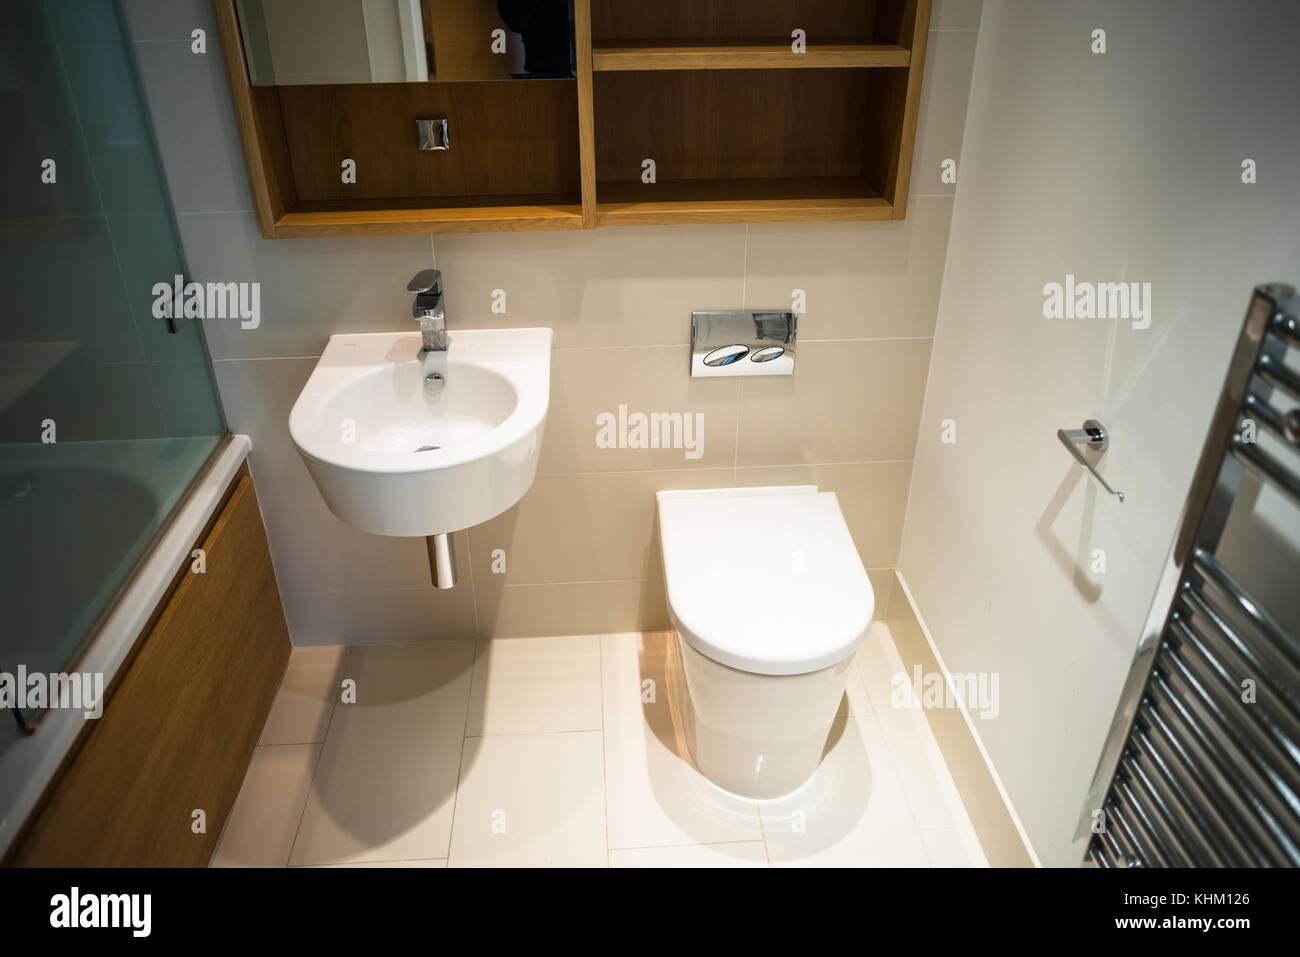 Vasca Da Bagno Nuova : Una moderna stanza da bagno con wc lavabo e vasca da bagno in nuova